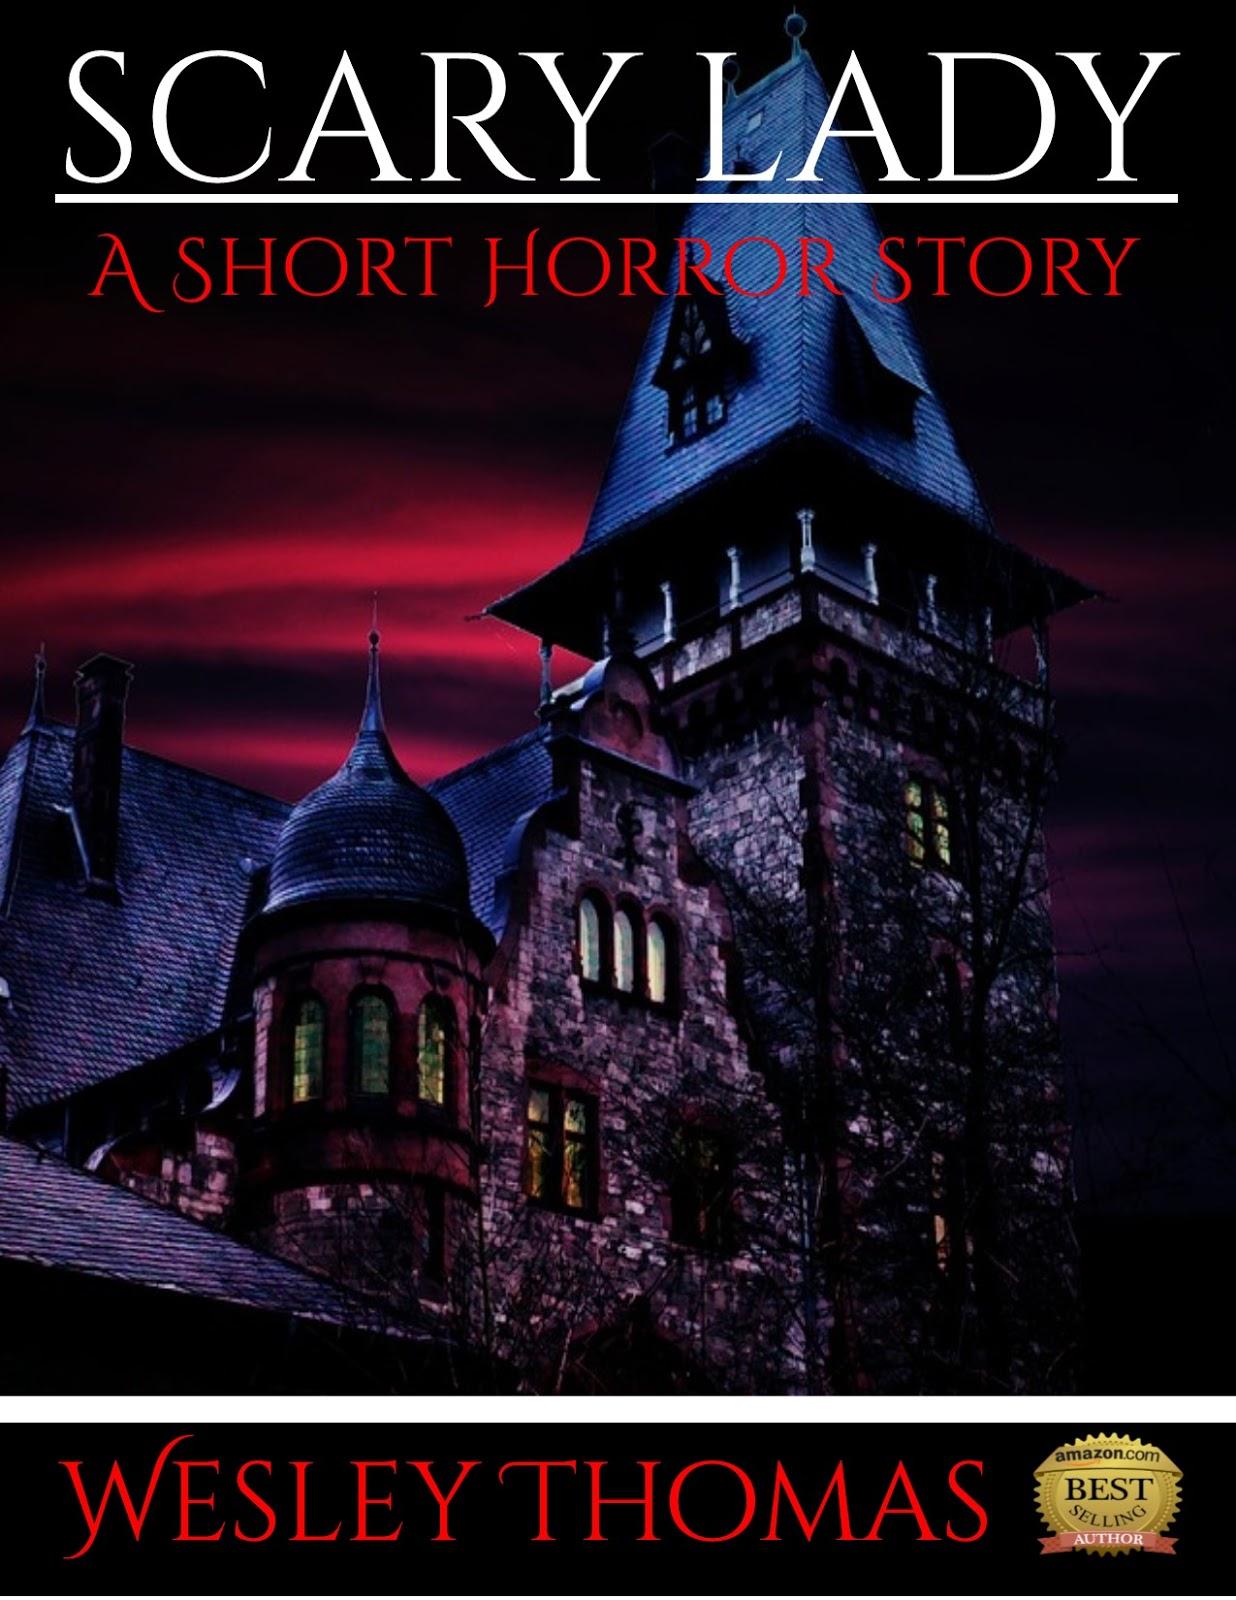 Scary Lady' Short Horror Story | Short Horror Stories